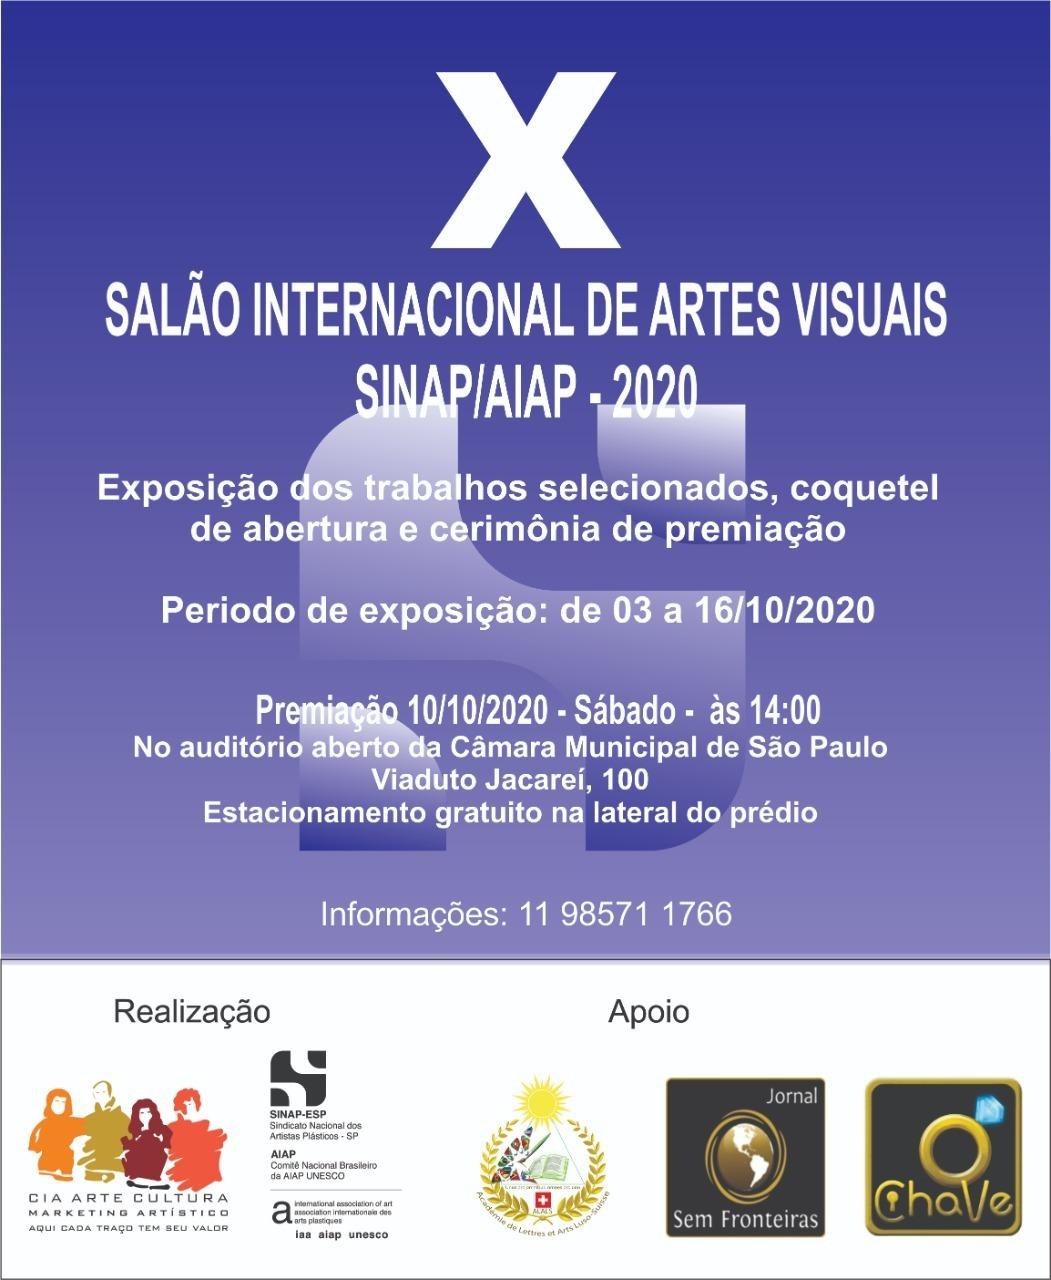 Imagem capa - First official art exhibition in São Paulo  por Galeria MoriSarti